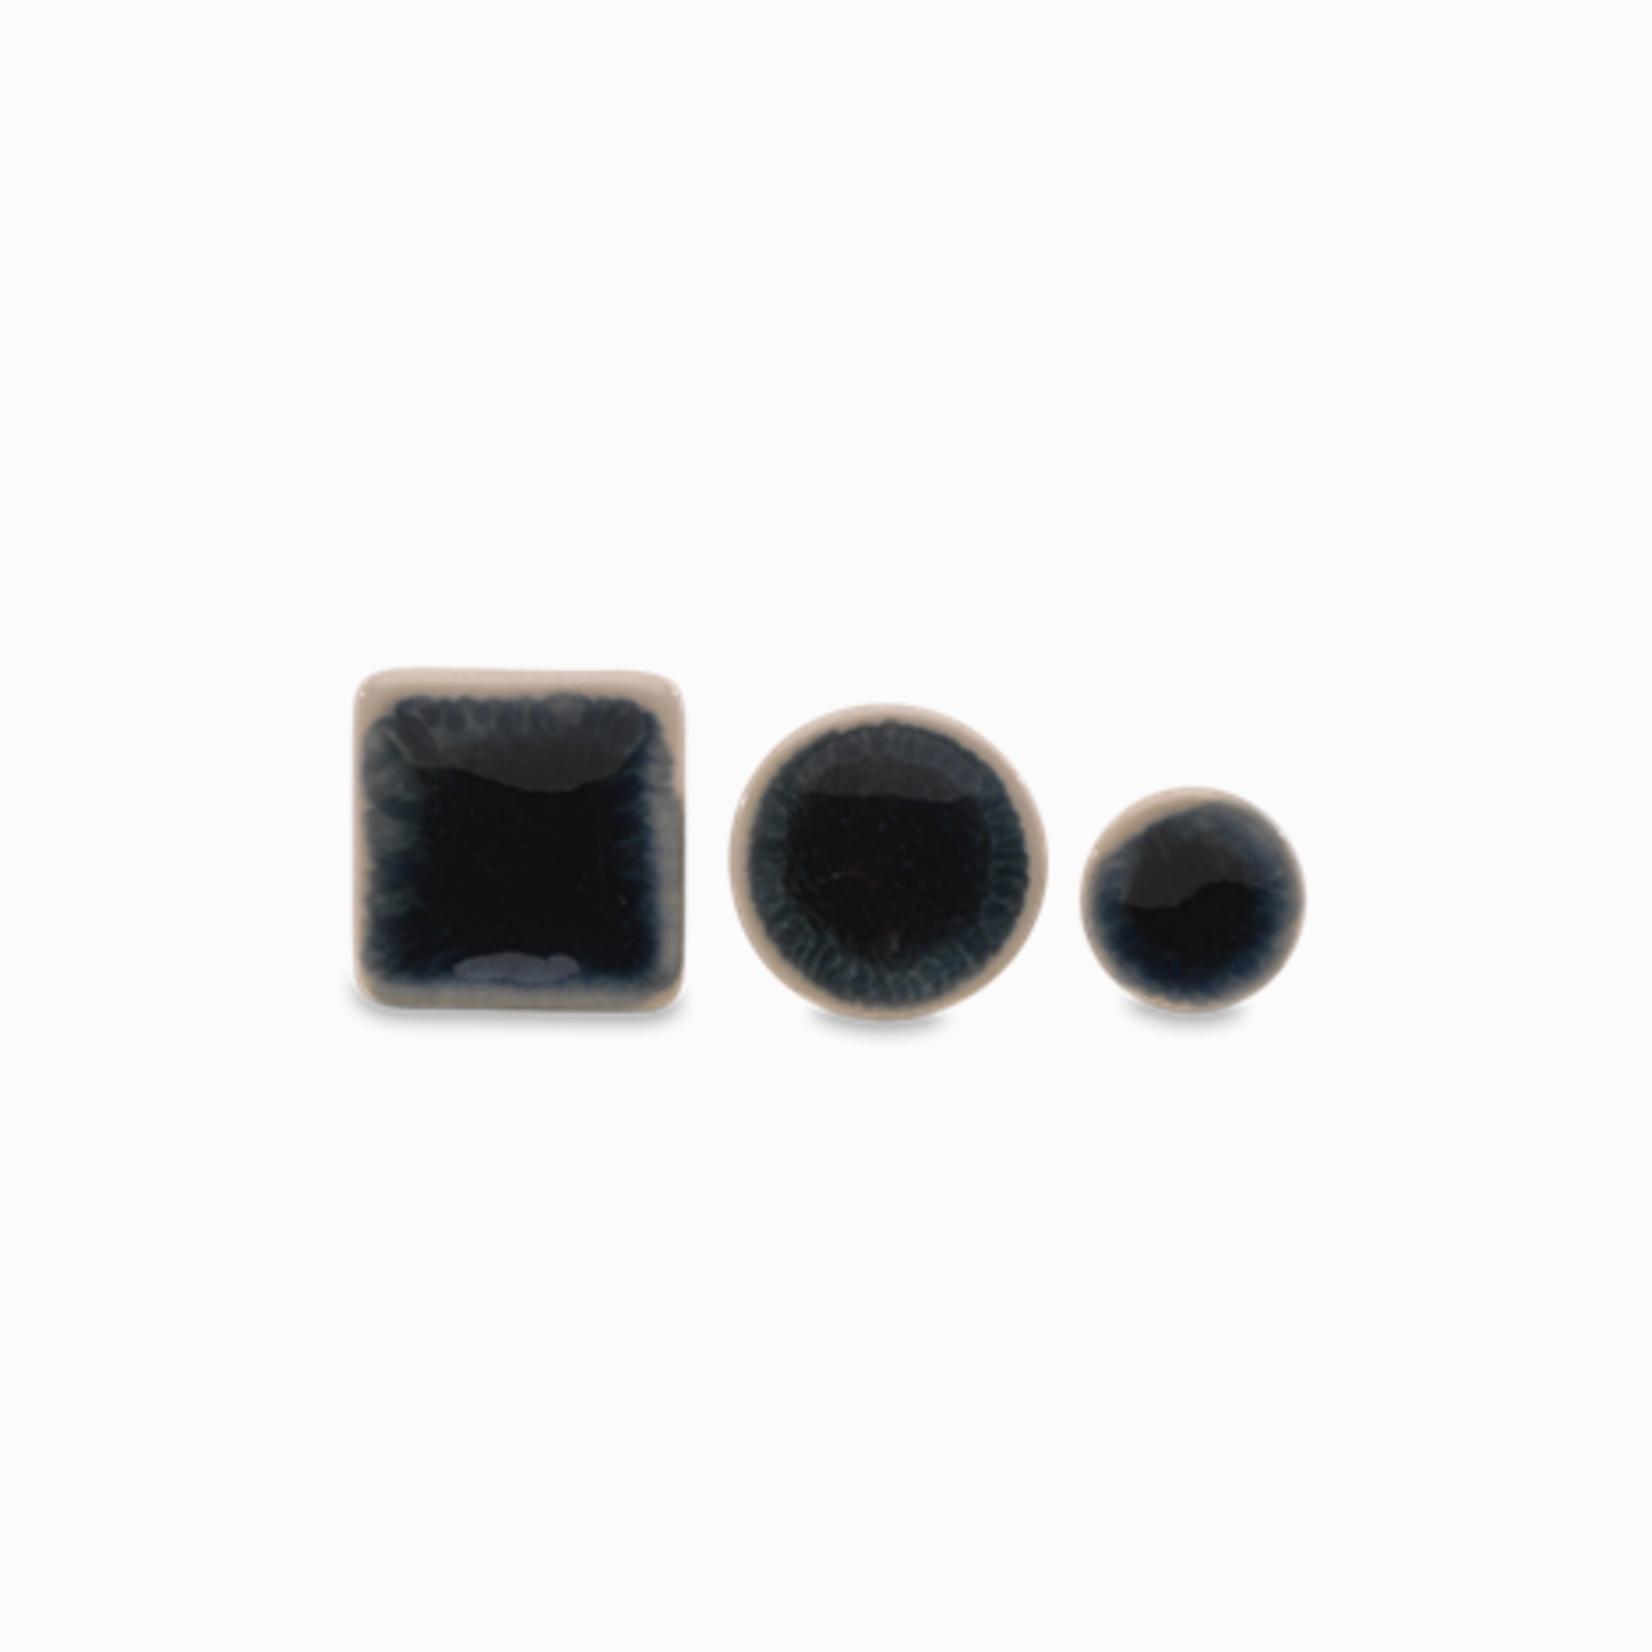 Nkuku Bira Ink Ceramic Knob - Small Round